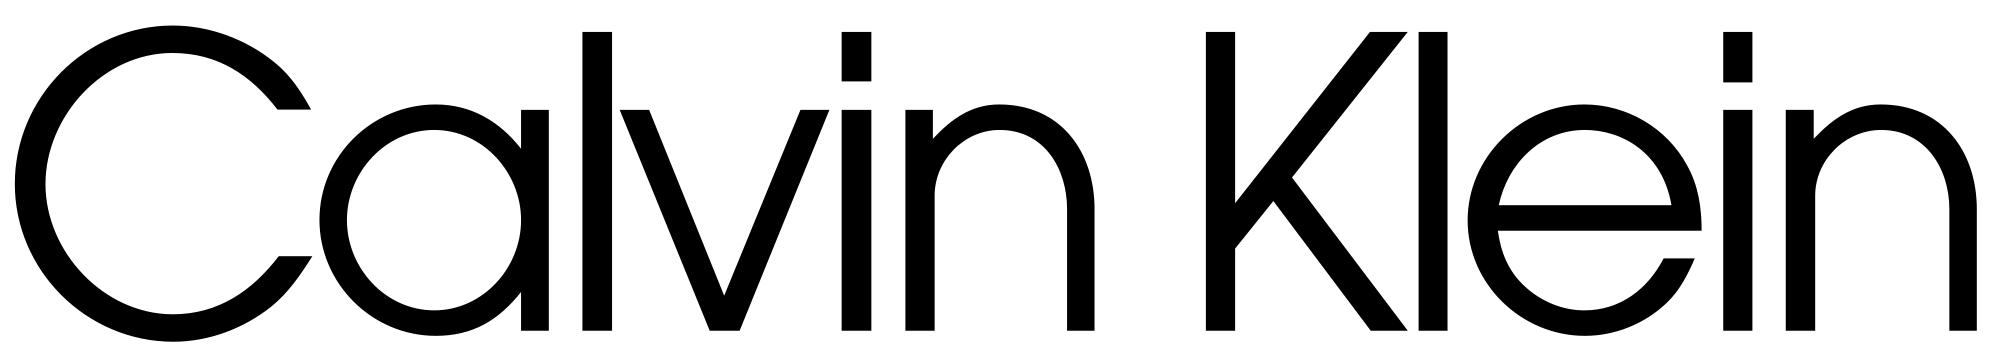 Calvin Klein logo. Calvin Klein collaboration with winkl for their influencer marketing campaign.